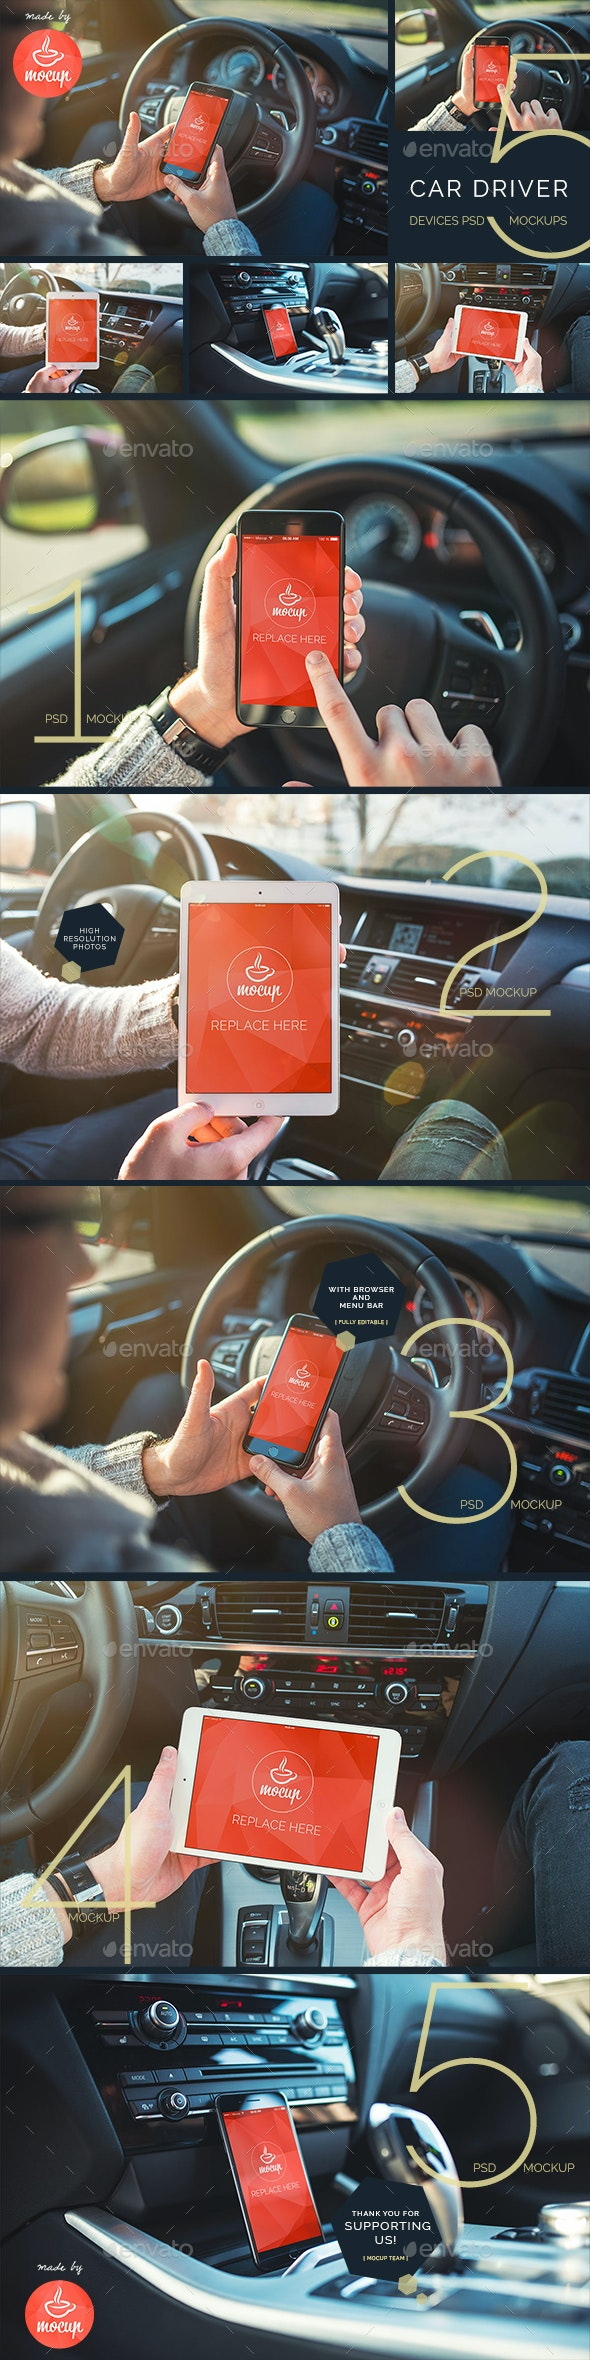 5 PSD Car Driver Responsive Phone and Tablet Mockups - Mobile Displays